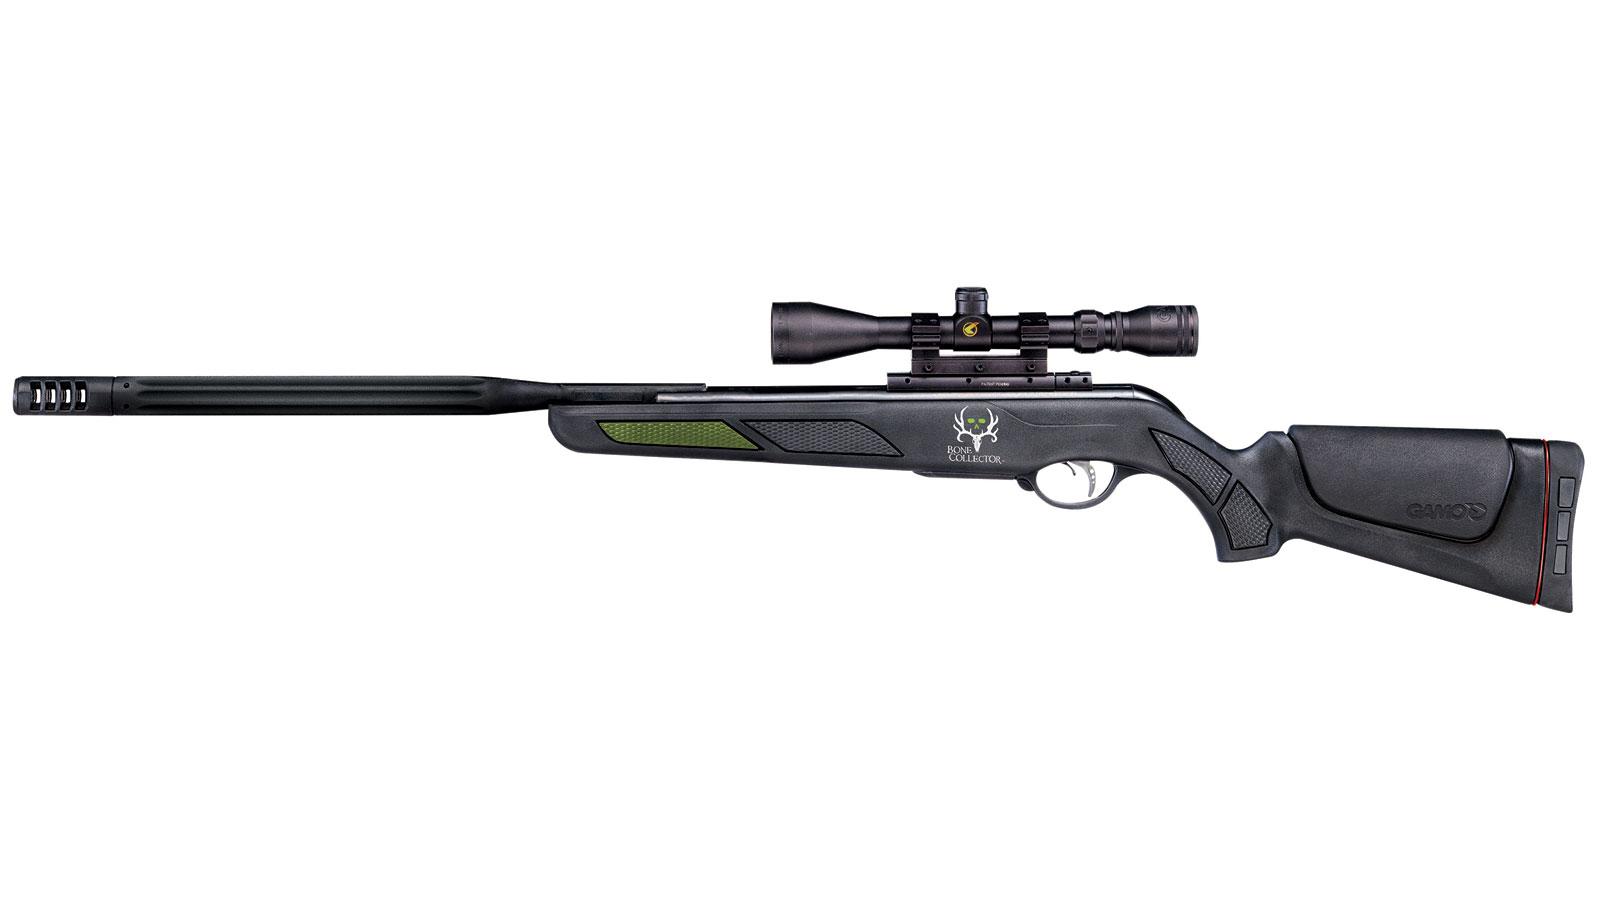 Gamo 611006254 Bone Collector Maxxim Air Rifle Break Open .177 Pellet 3-9x40 Scope Black Synthetic Stock Black